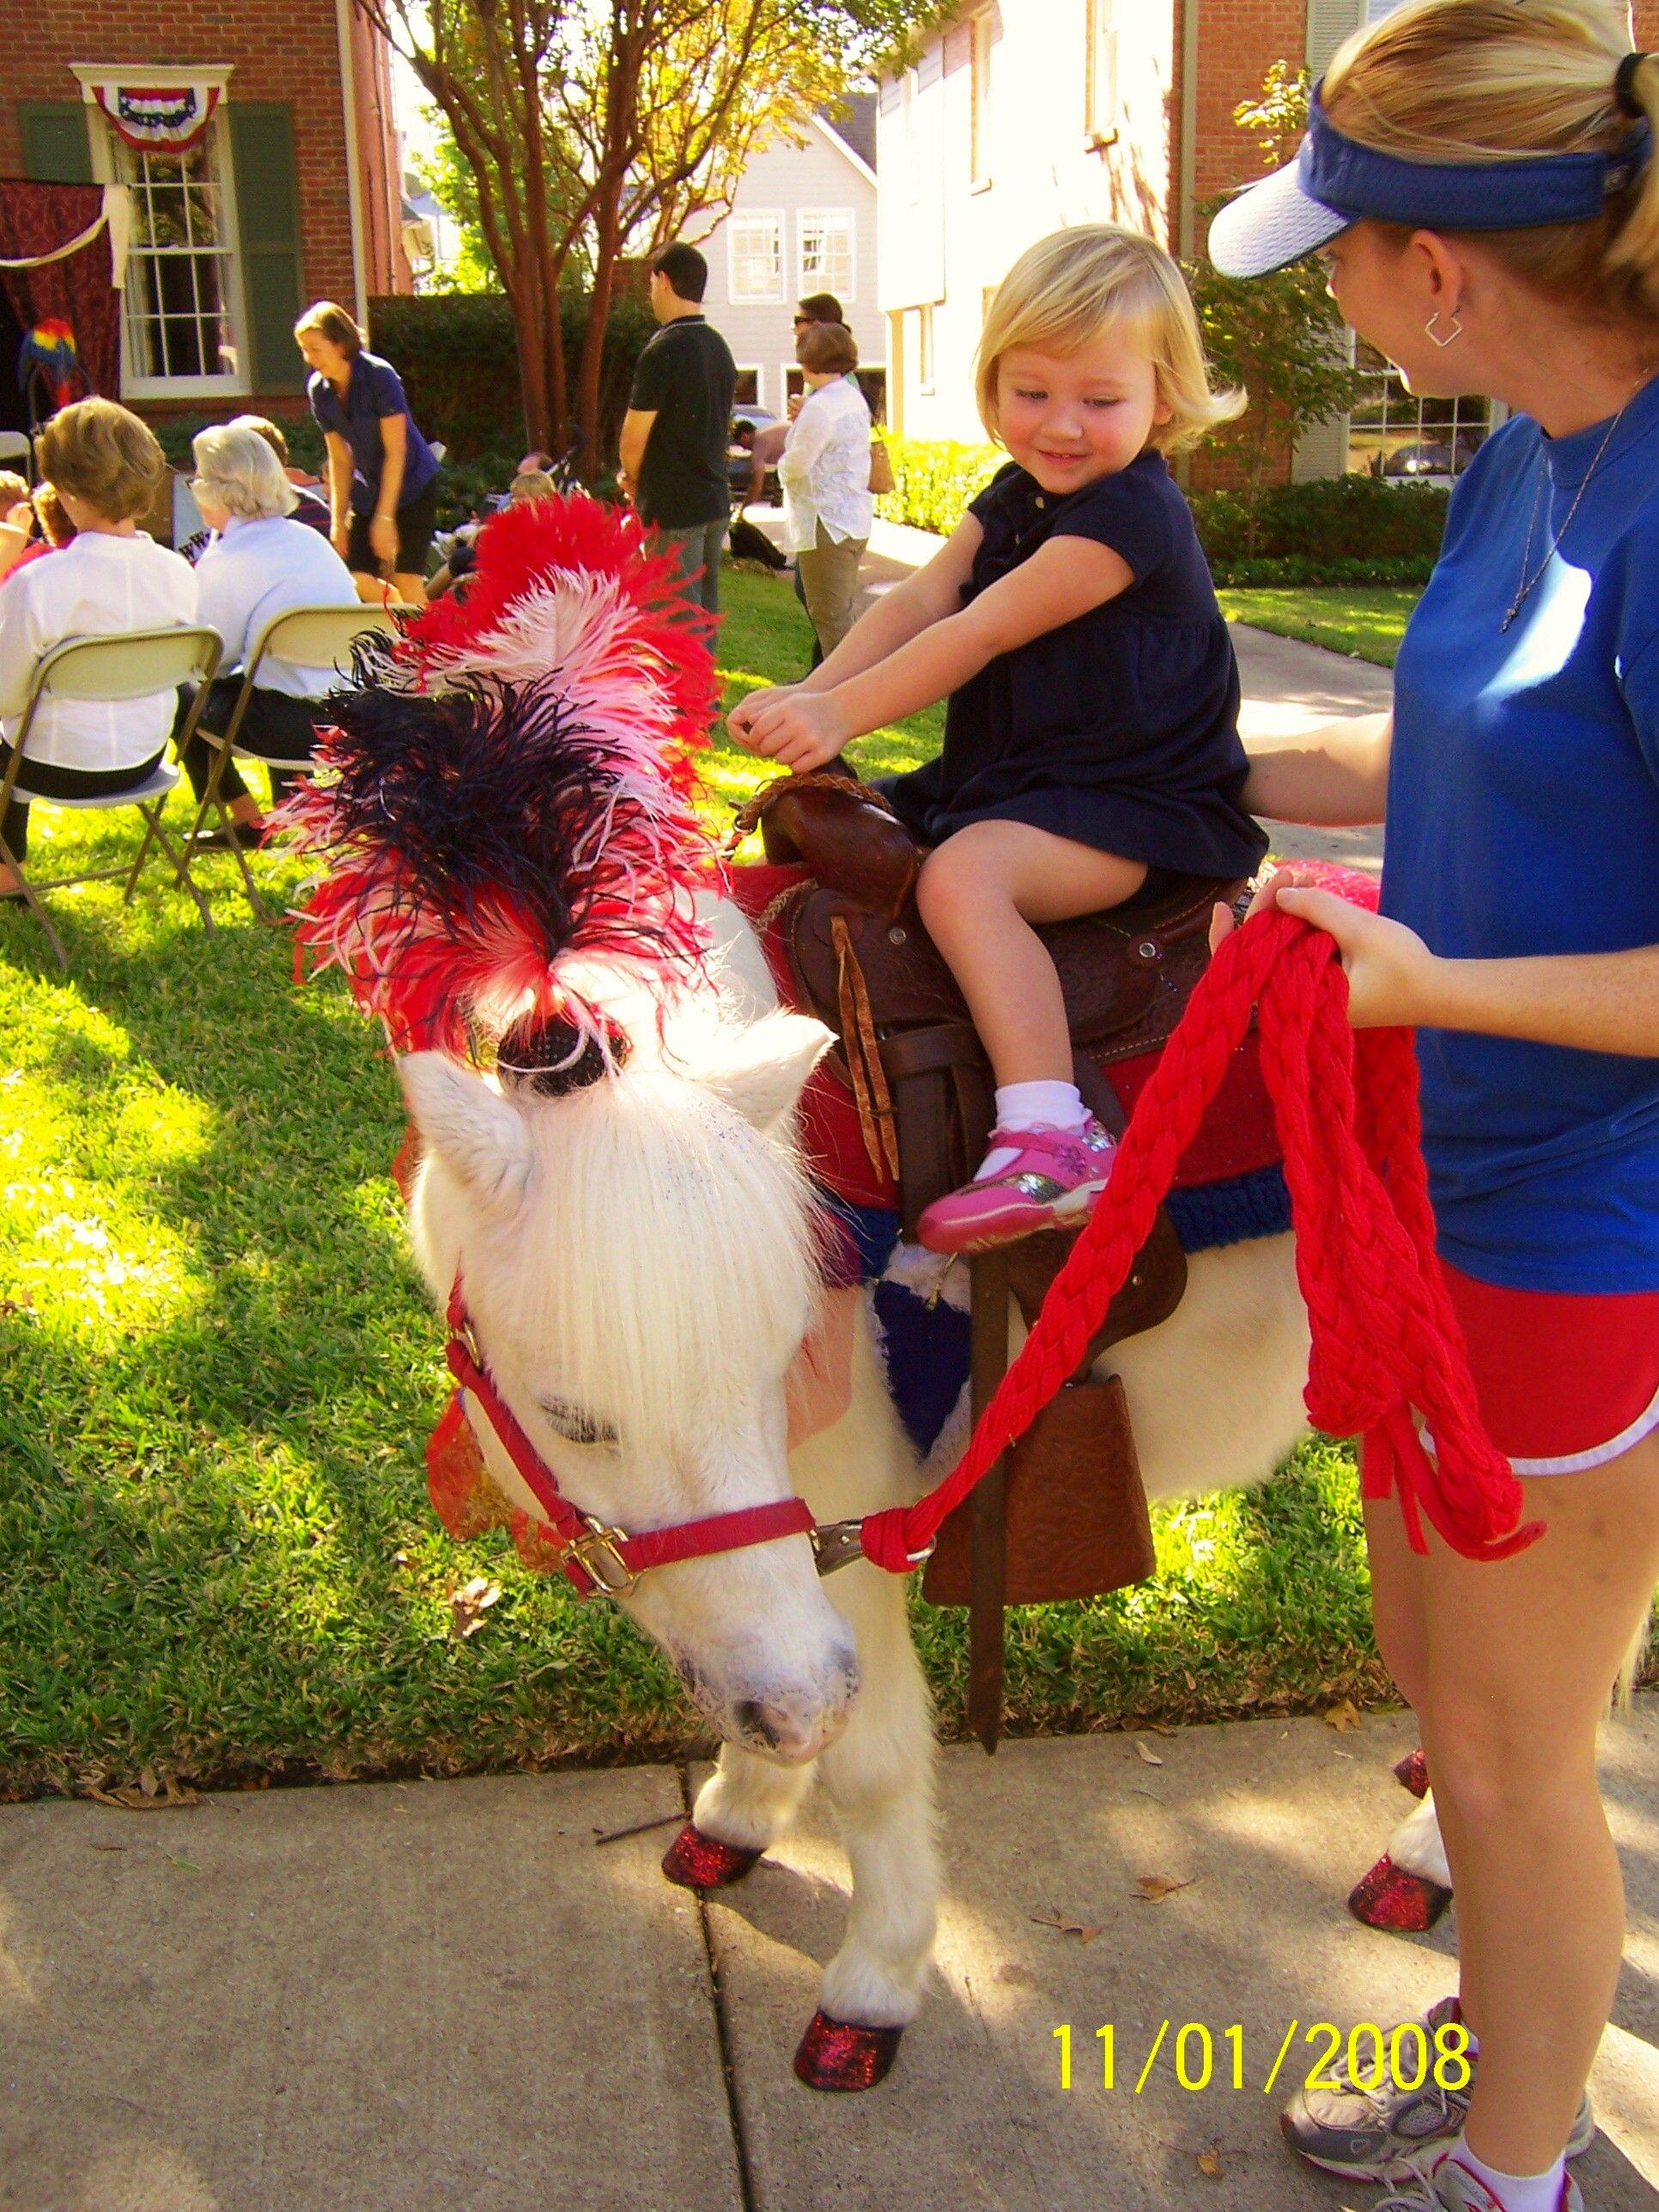 PONY RIDES, Dallas PETTING ZOO, Pony PARTY, Dallas, TX